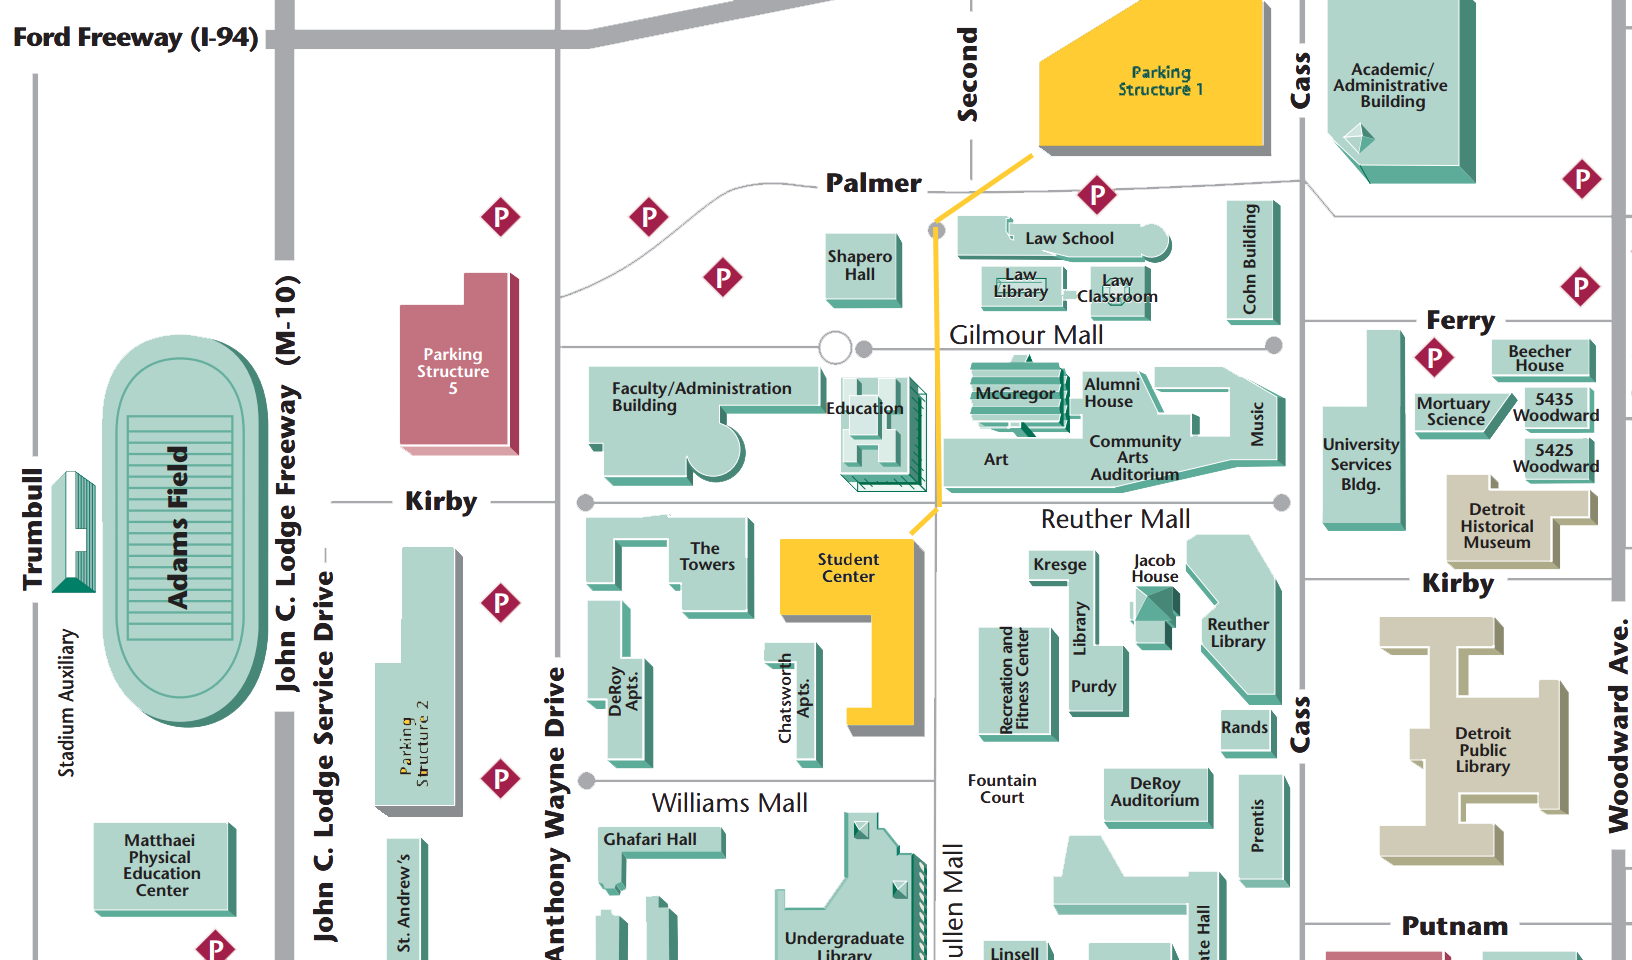 Wayne State University Campus Map - Student Center